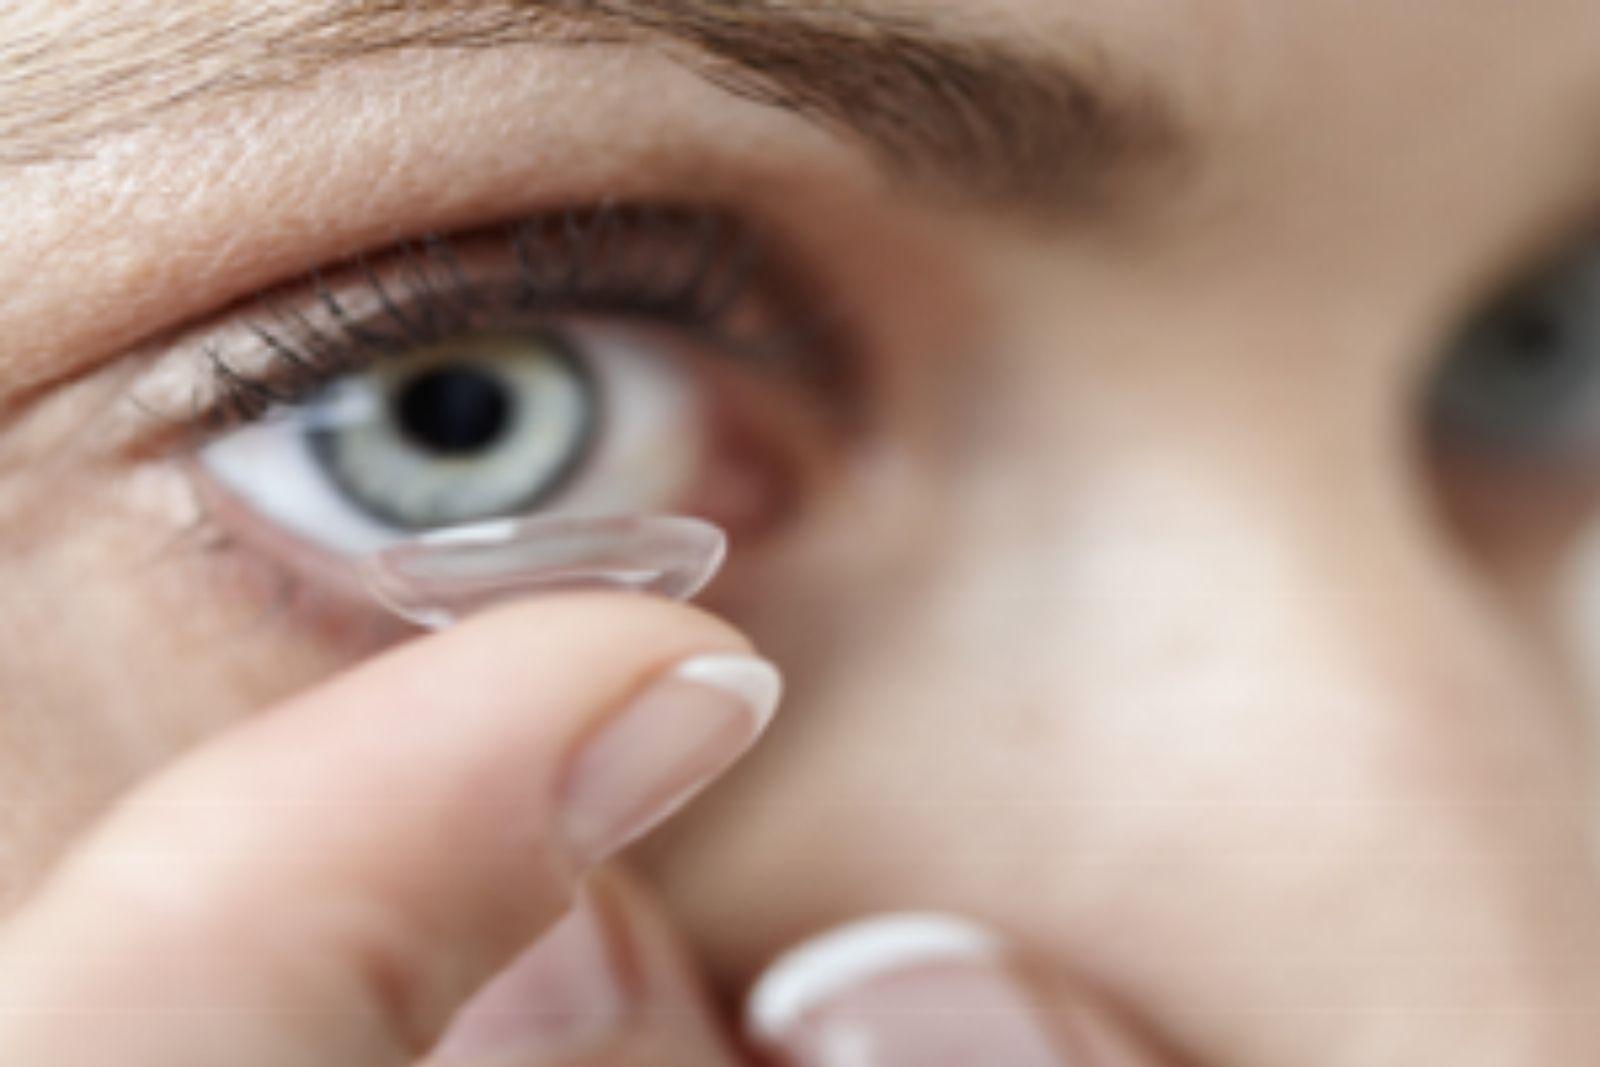 opticien contactologue paris 16